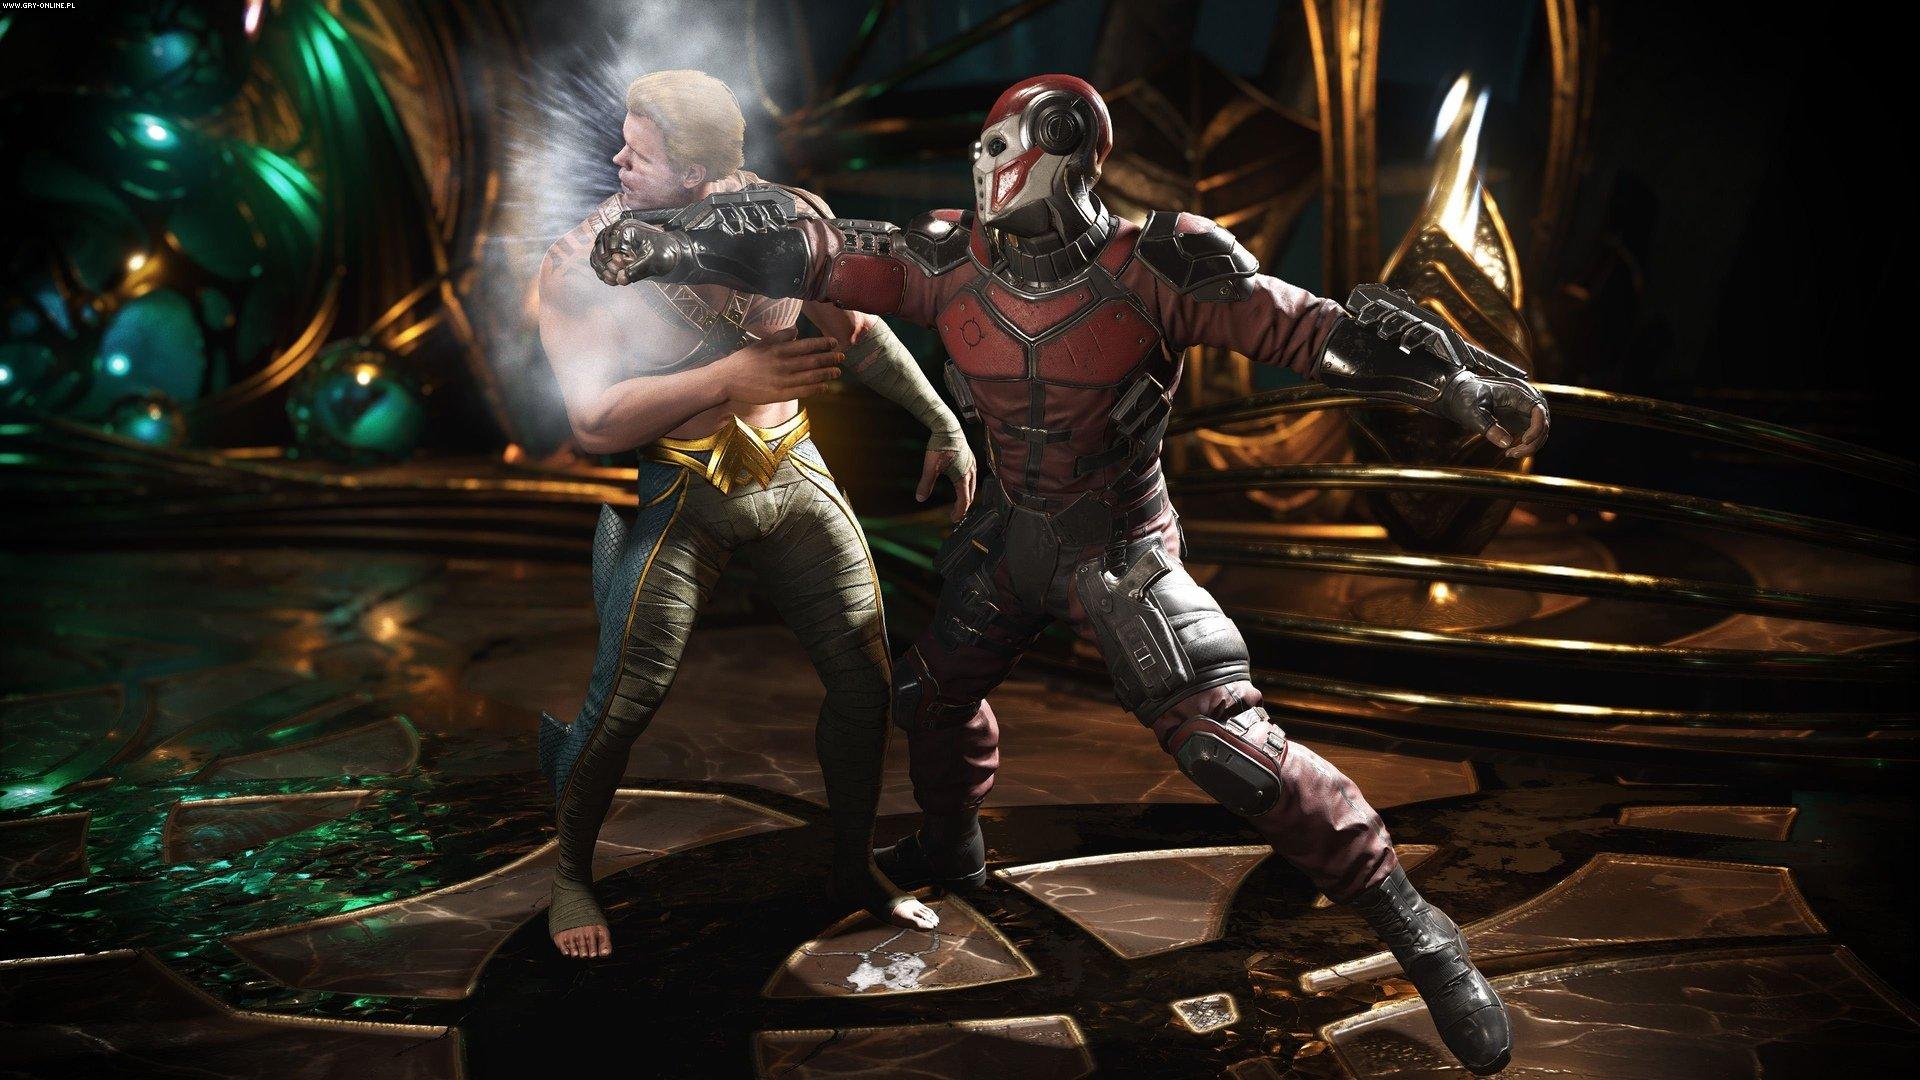 Injustice 2 PC, PS4, XONE Games Image 19/24, NetherRealm Studios , Warner Bros. Interactive Entertainment